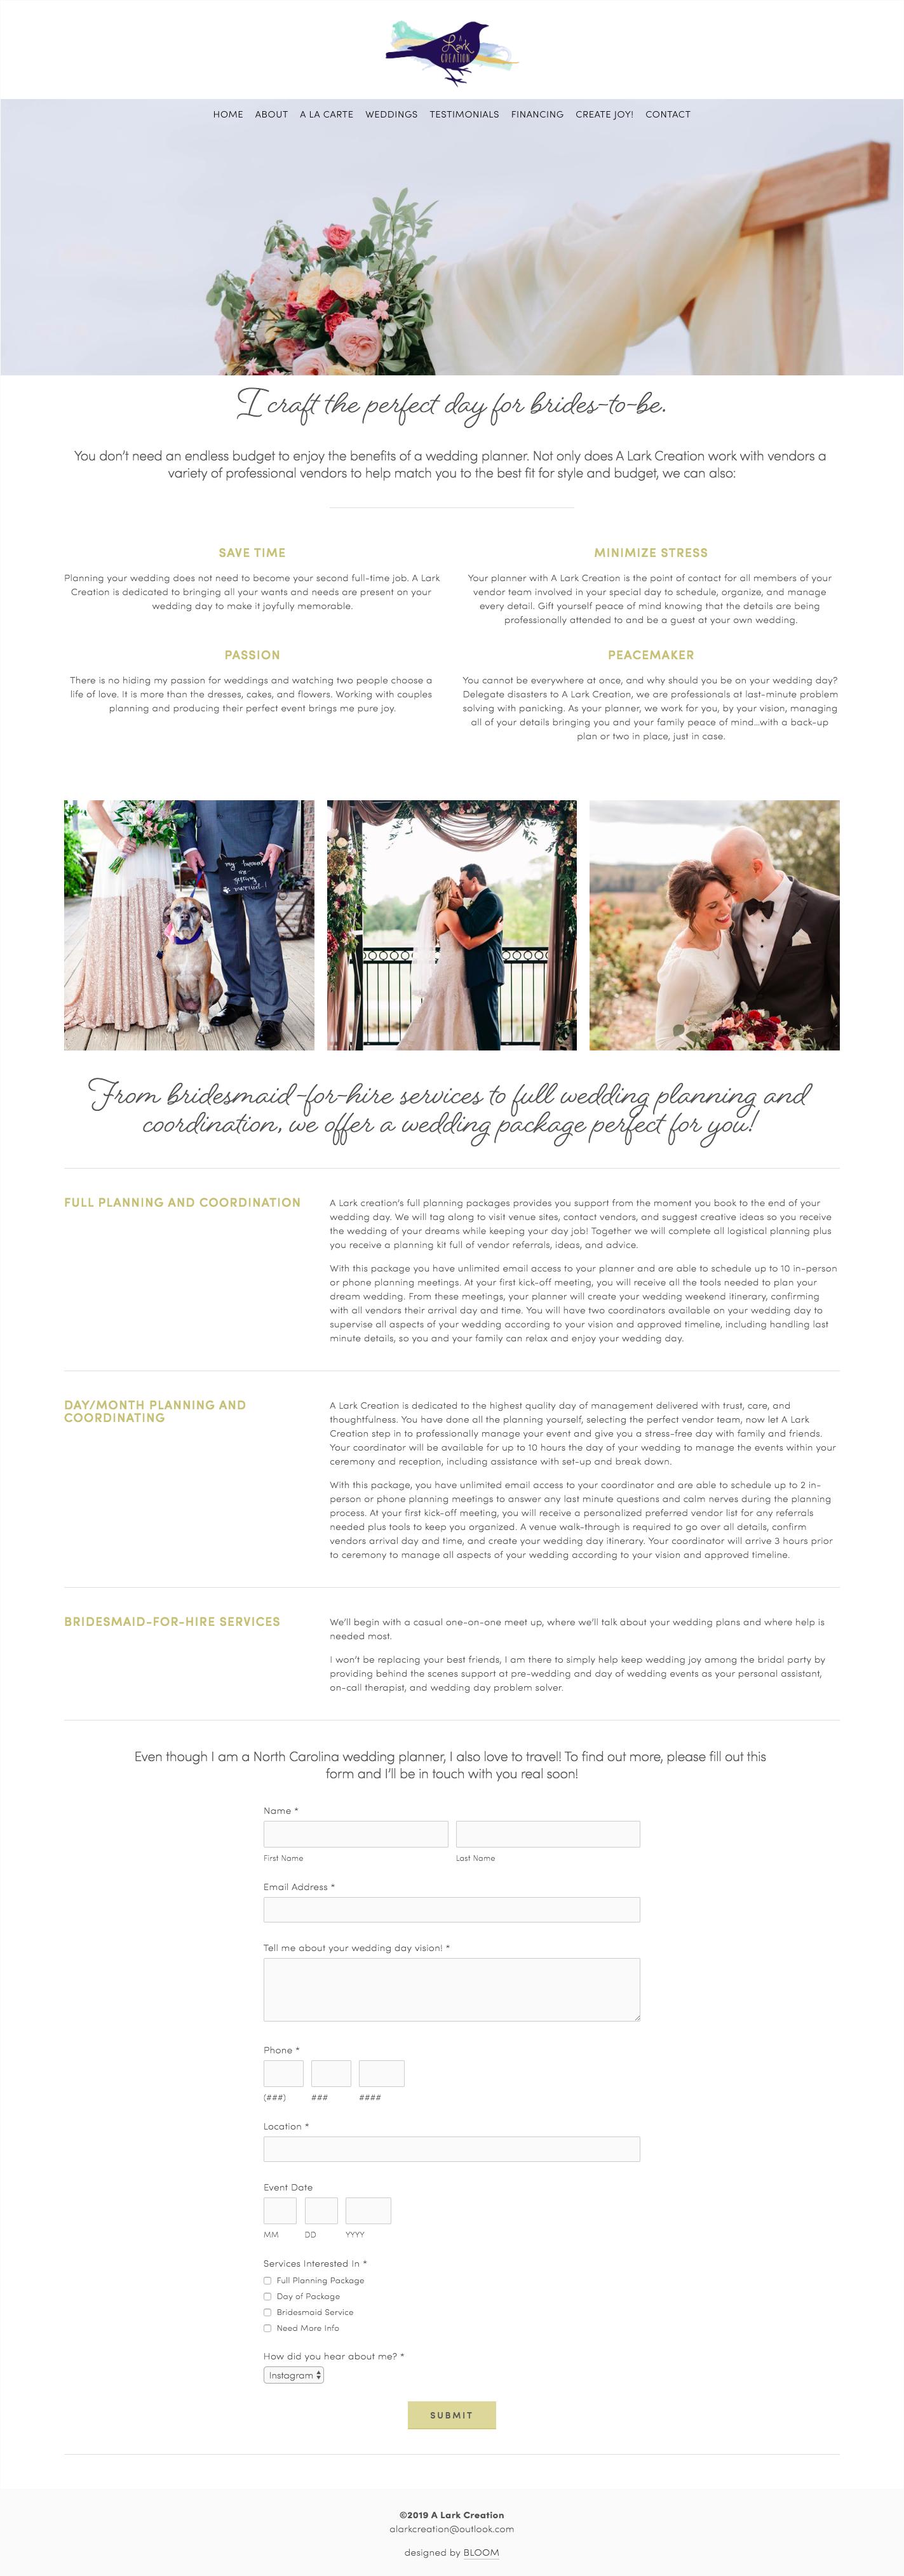 screencapture-bullfrog-amphibian-3xwr-squarespace-weddings-2019-02-17-17_30_19.png